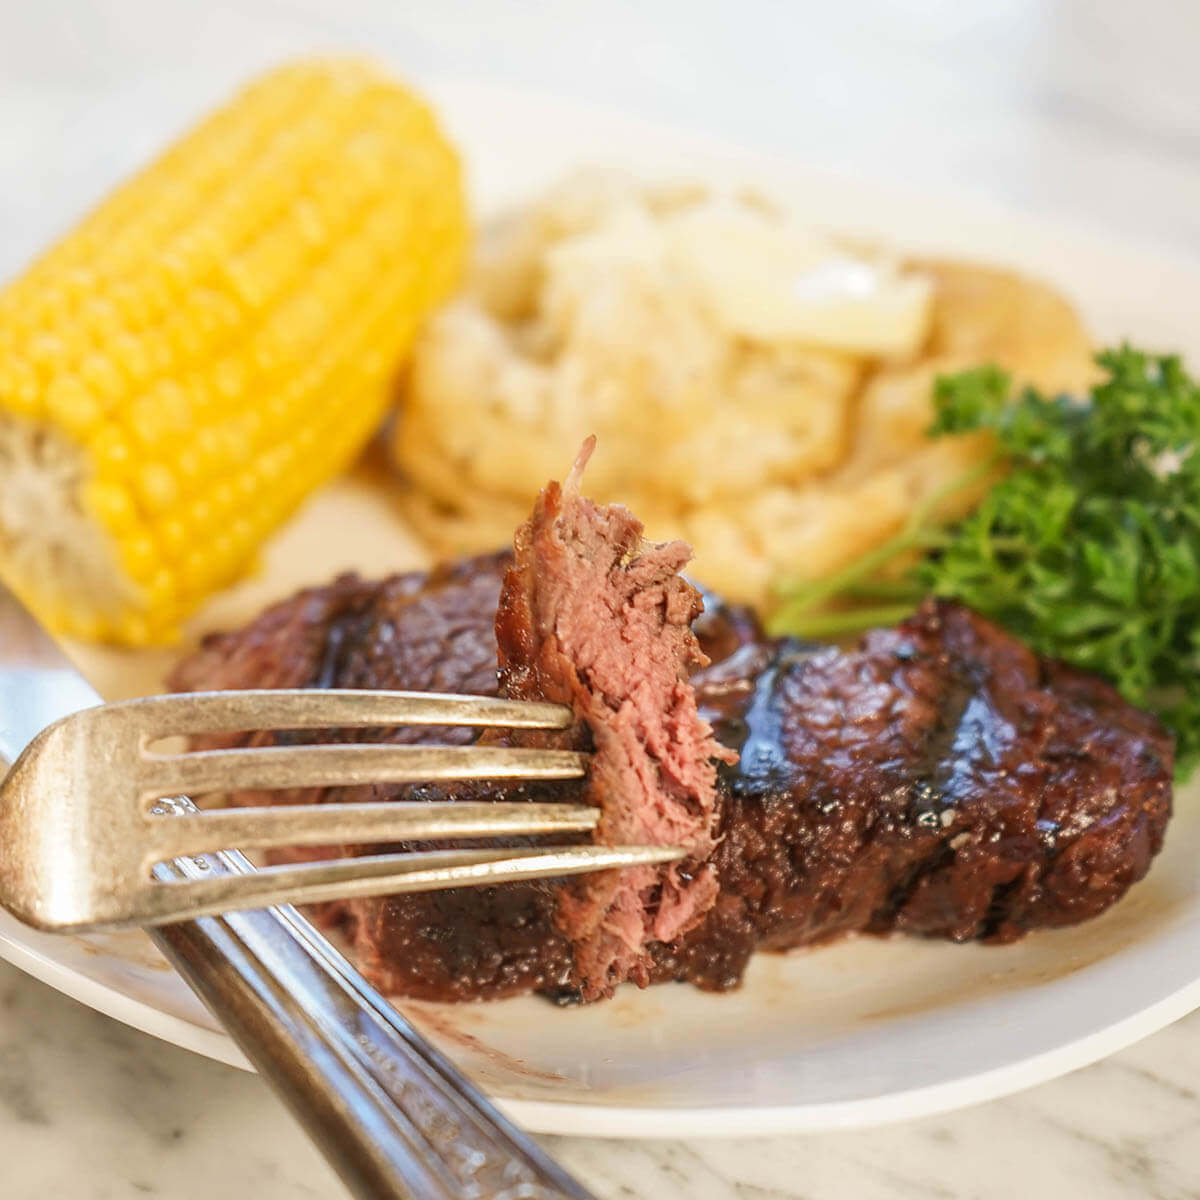 Tenderloin steak on plate with potatoes and corn.